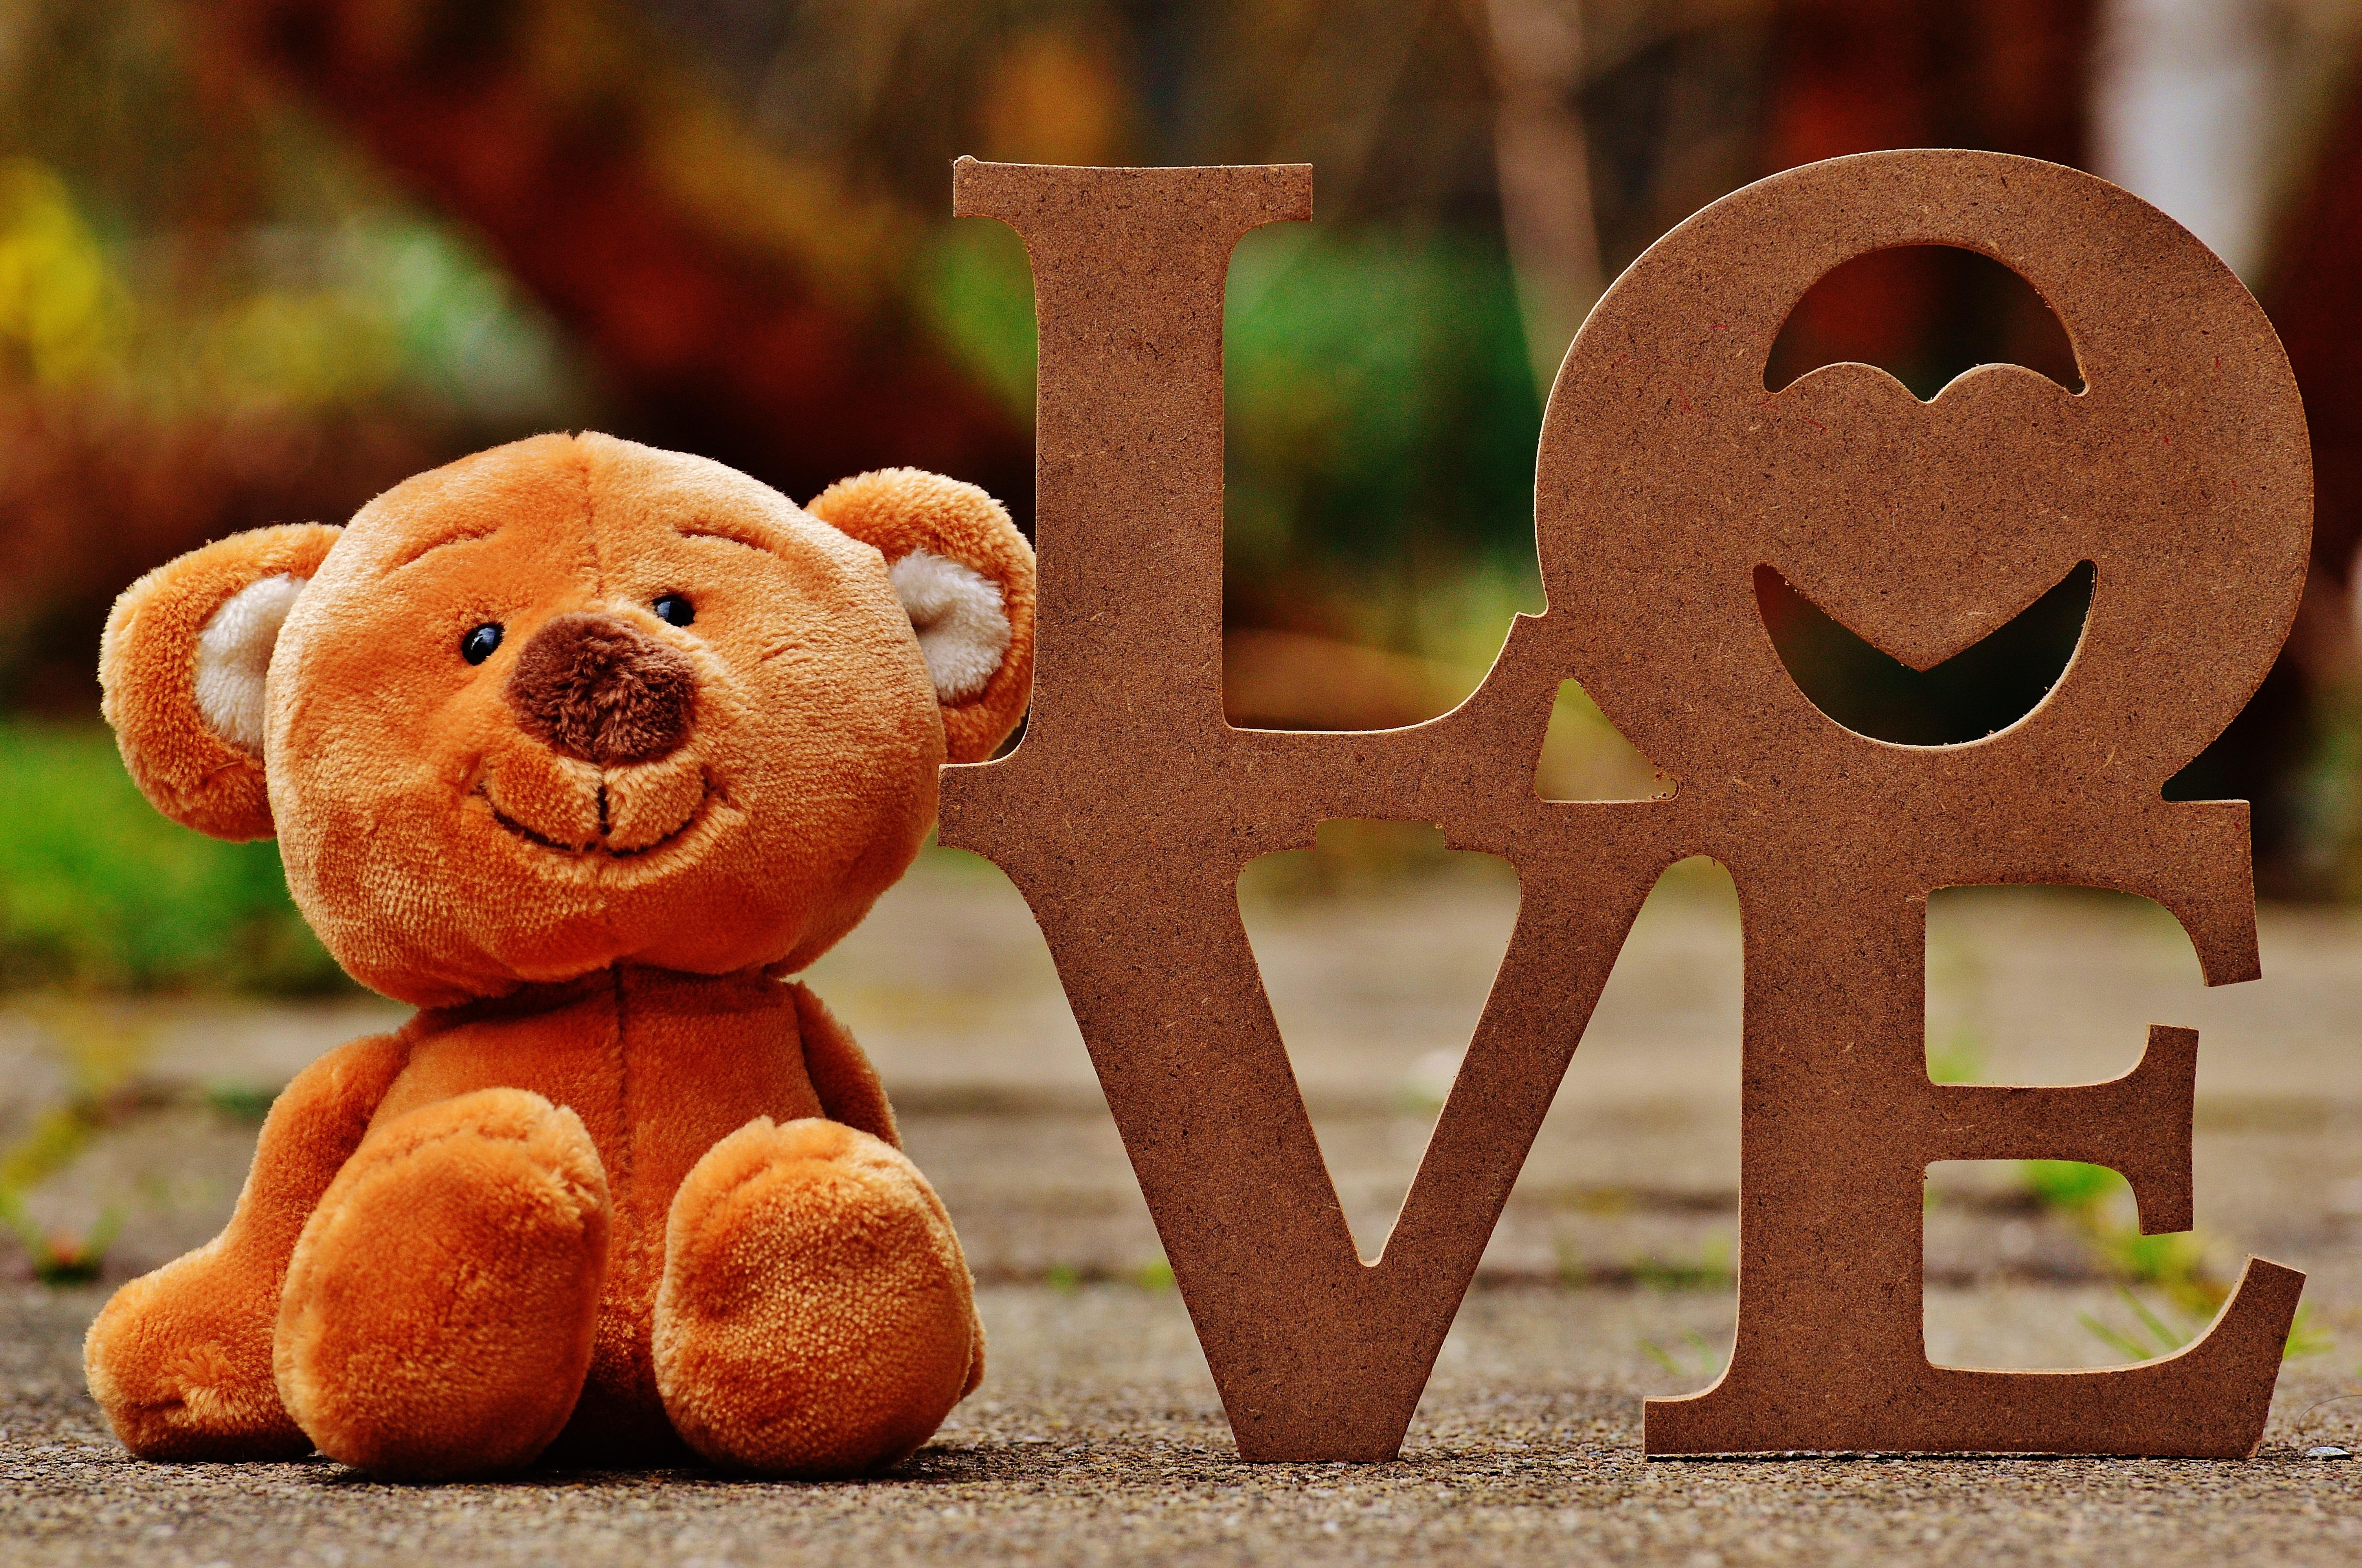 sweet animal cute bear love toy brown bear teddy bear children toys funny  plush stuffed animal